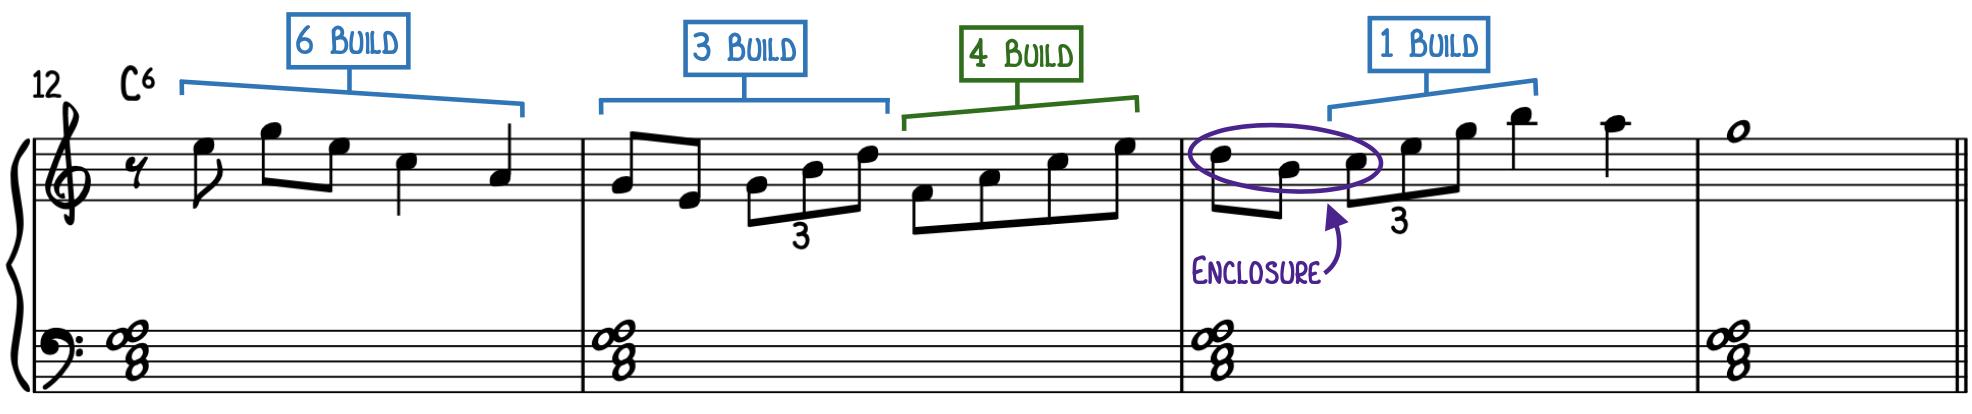 Solo Example 2 enclosure jazz piano improvisation